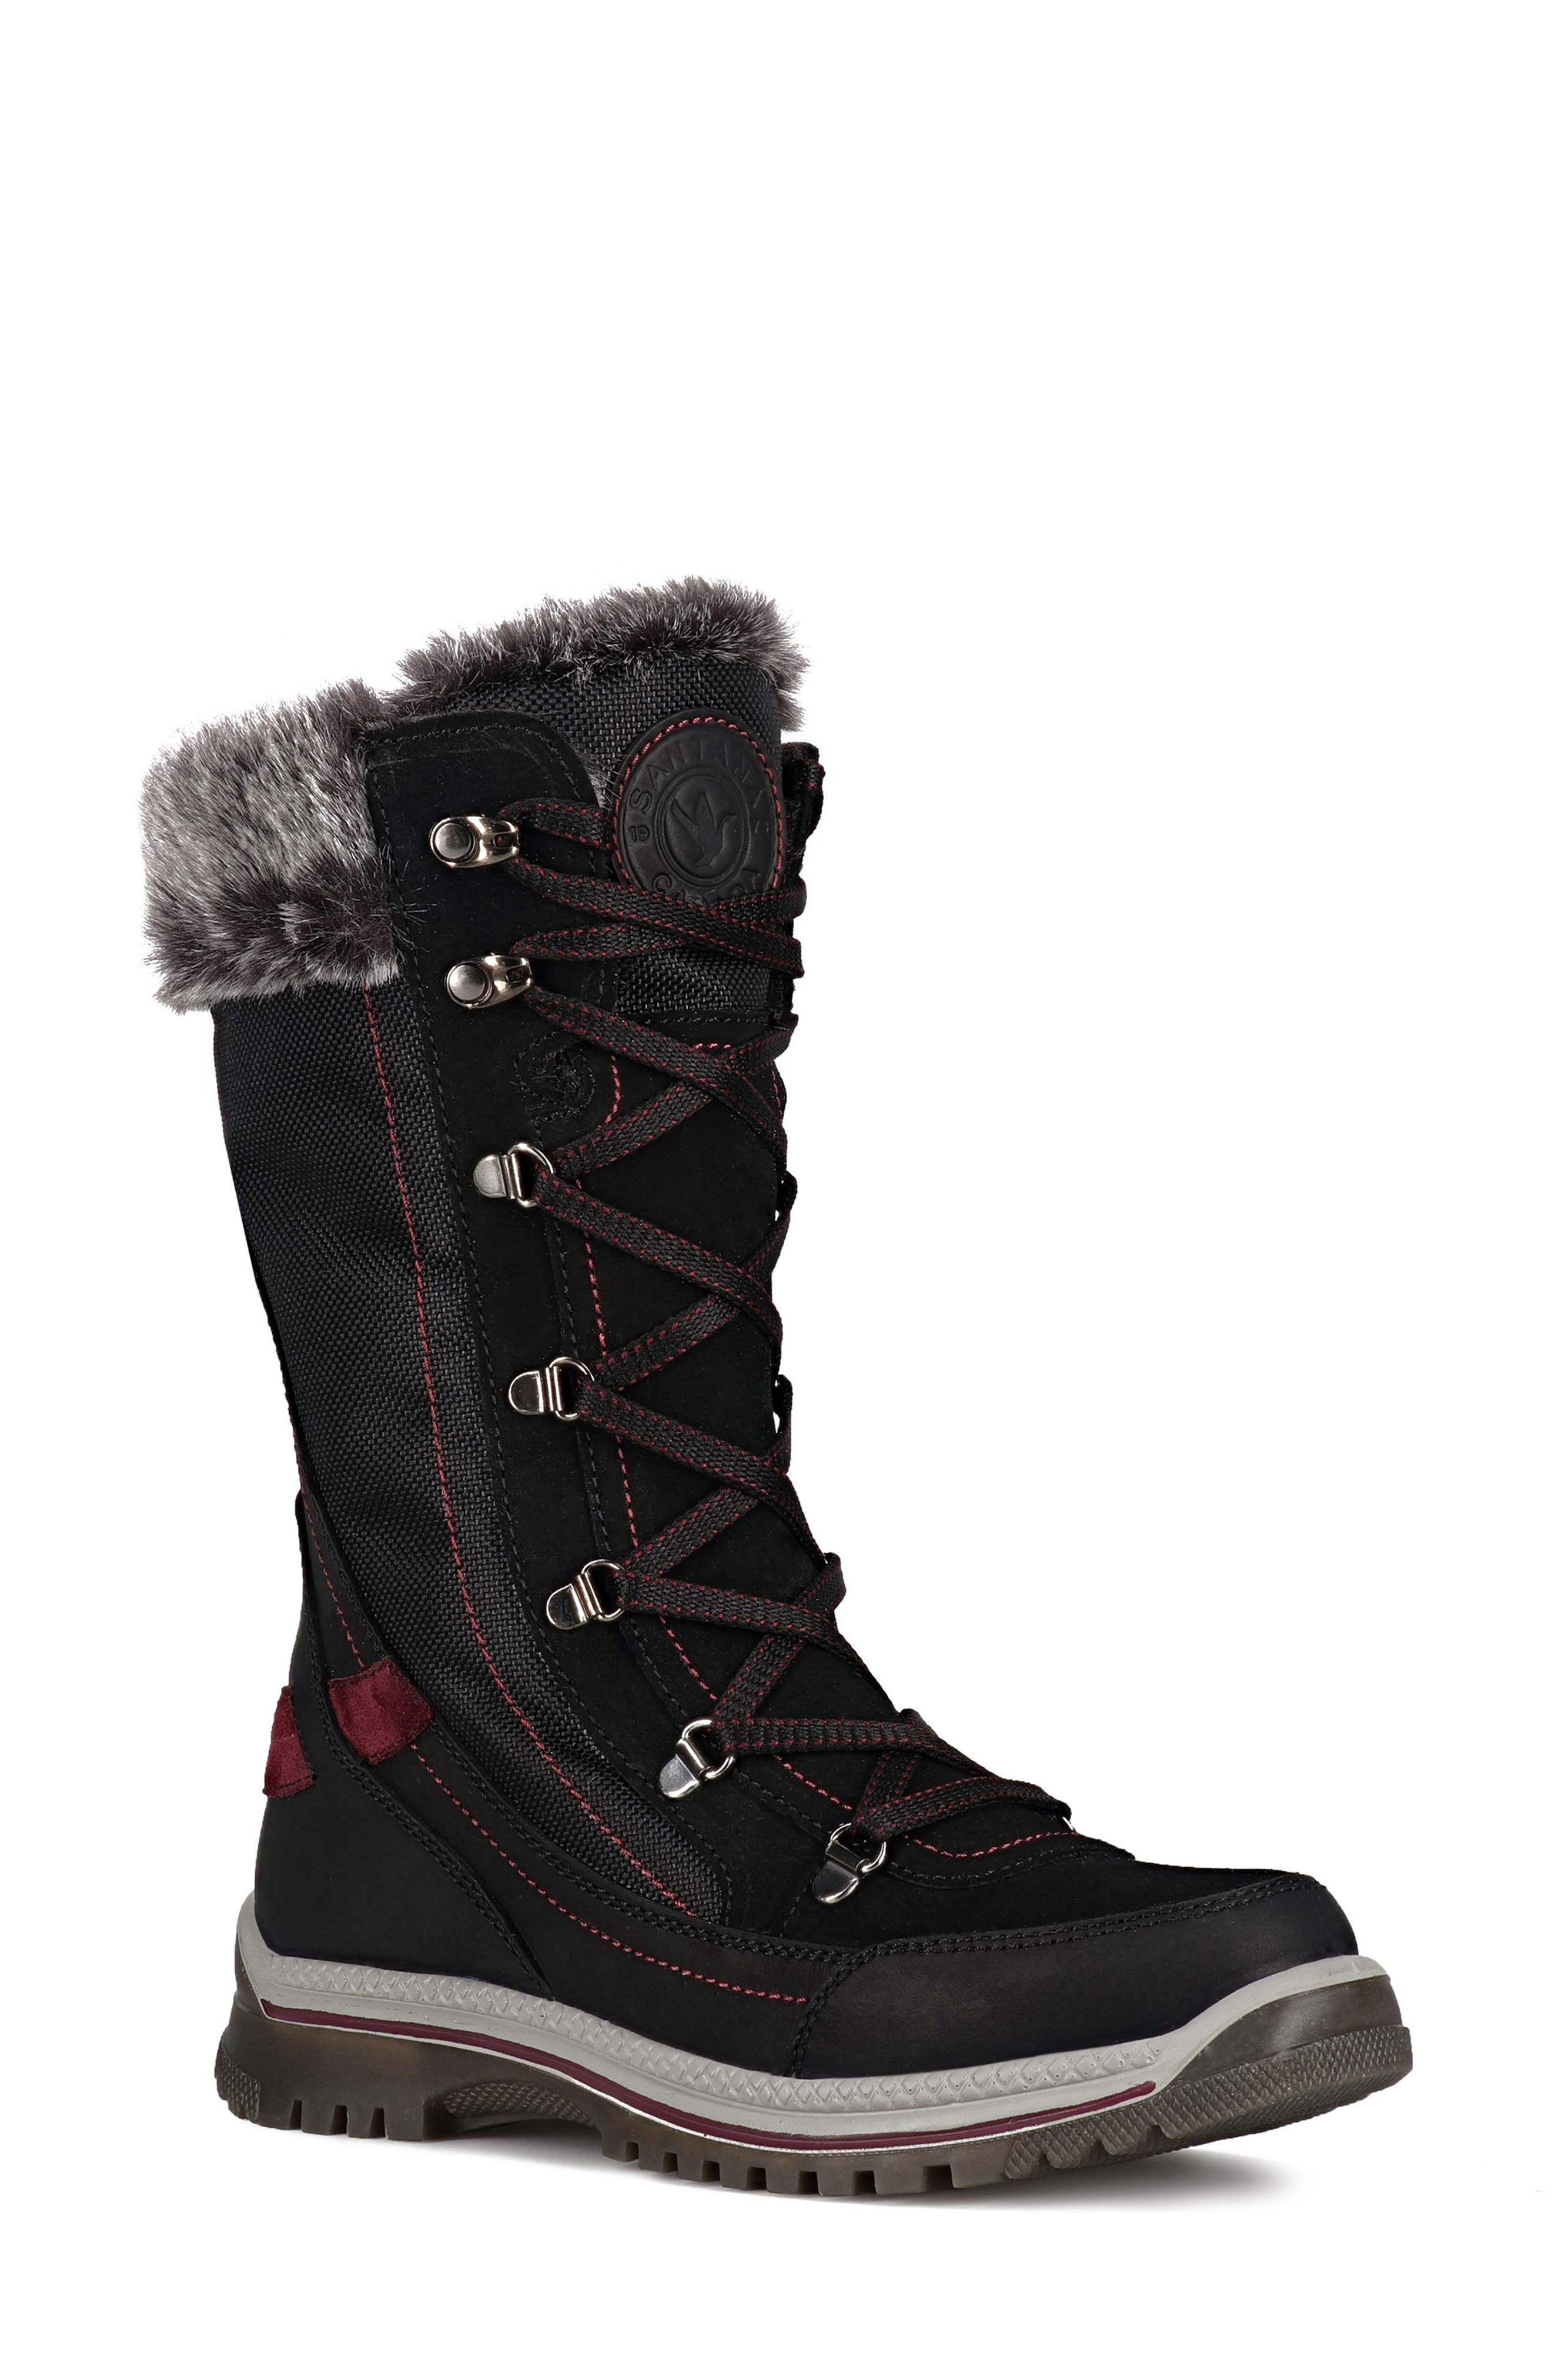 Women's Black Santana Canada Shoes